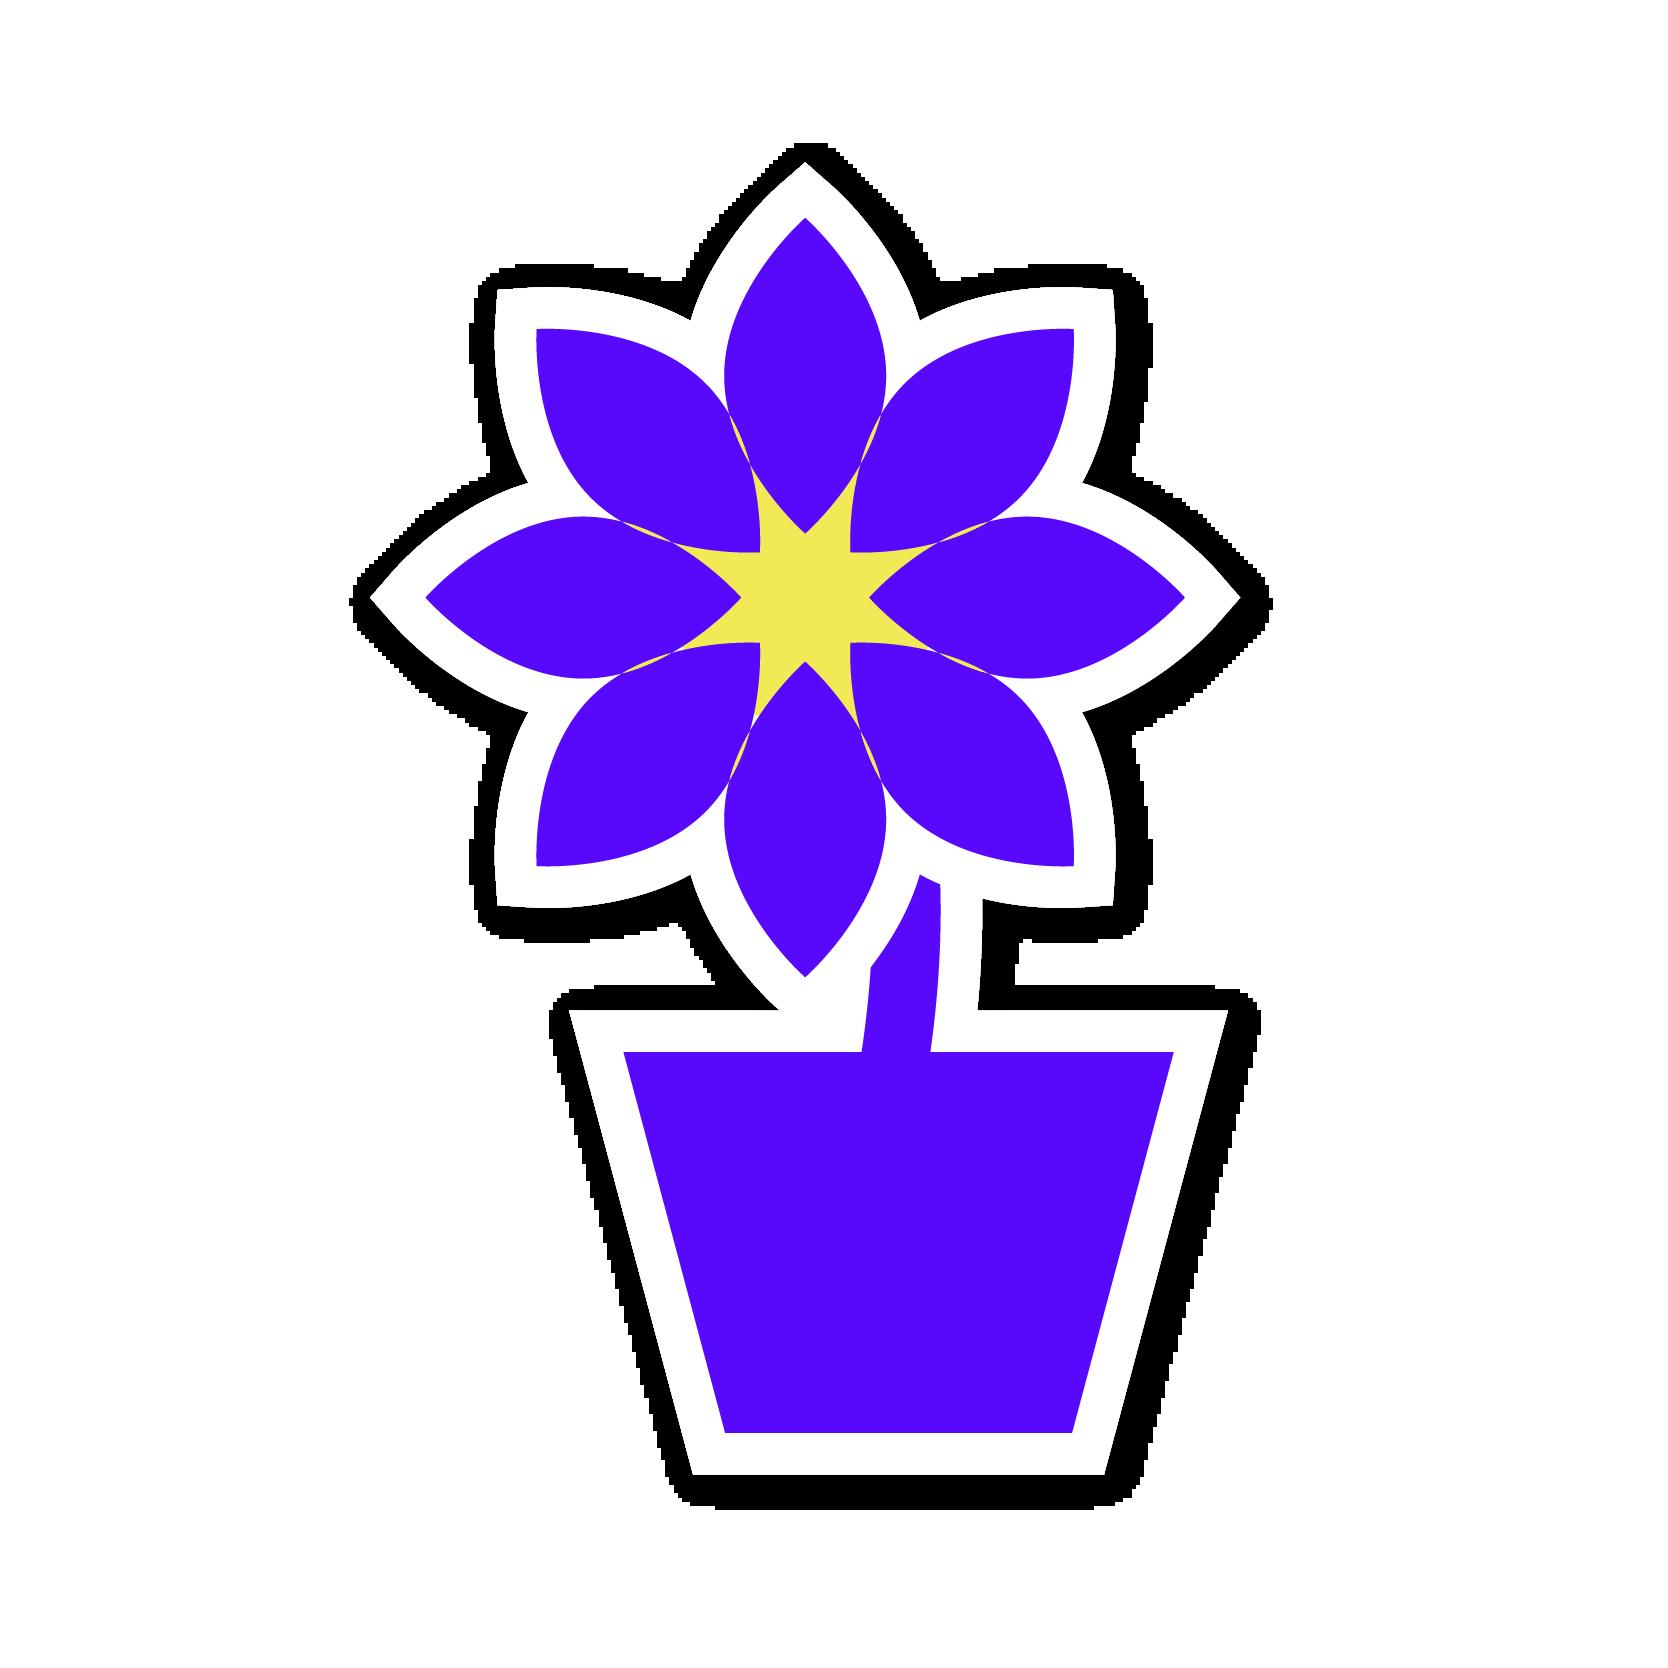 A purple plant sticker